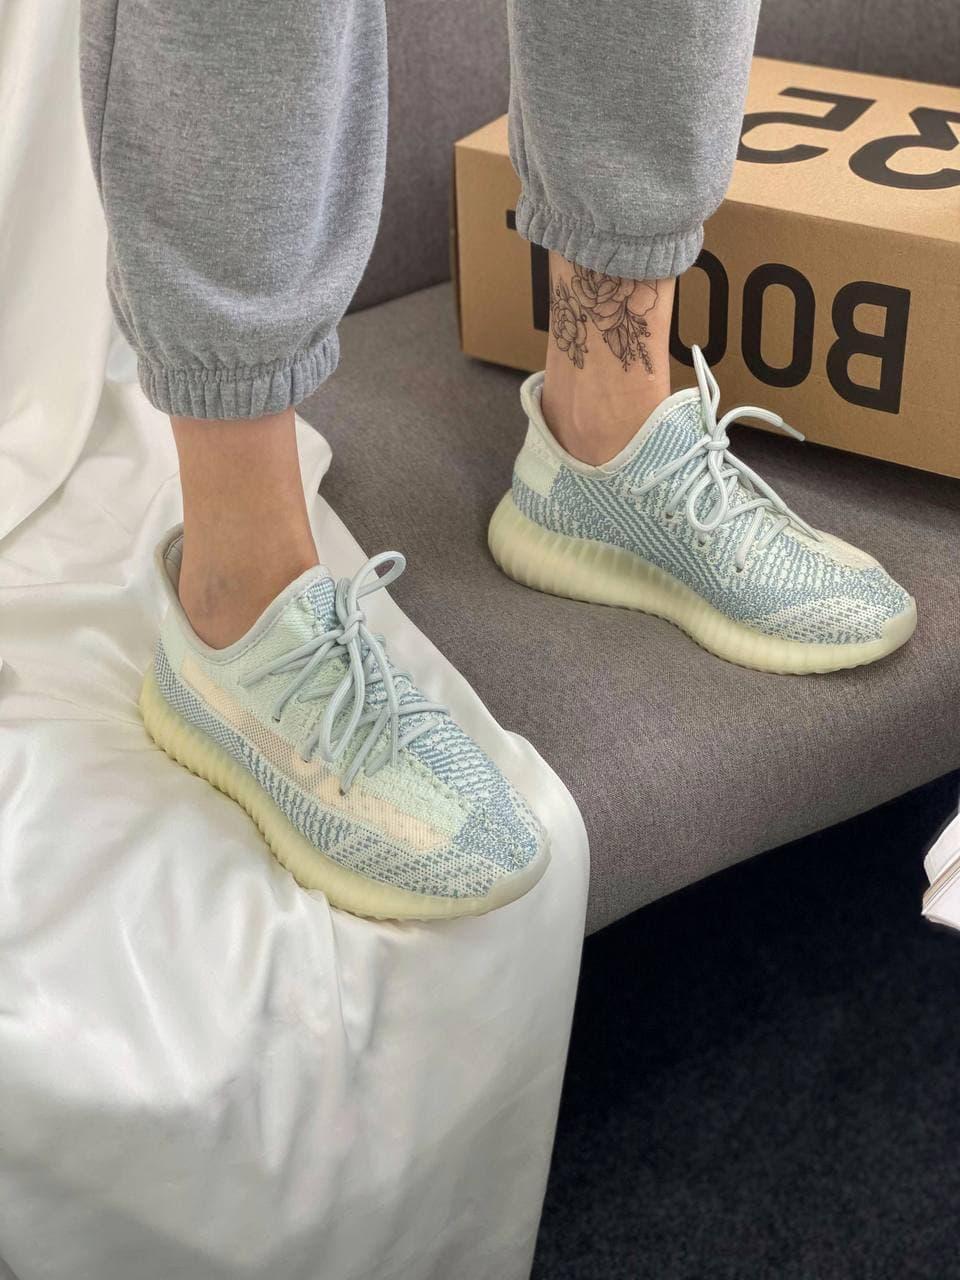 Жіночі кросівки Adidas Yeezy Boost 350 V2 Cloud White